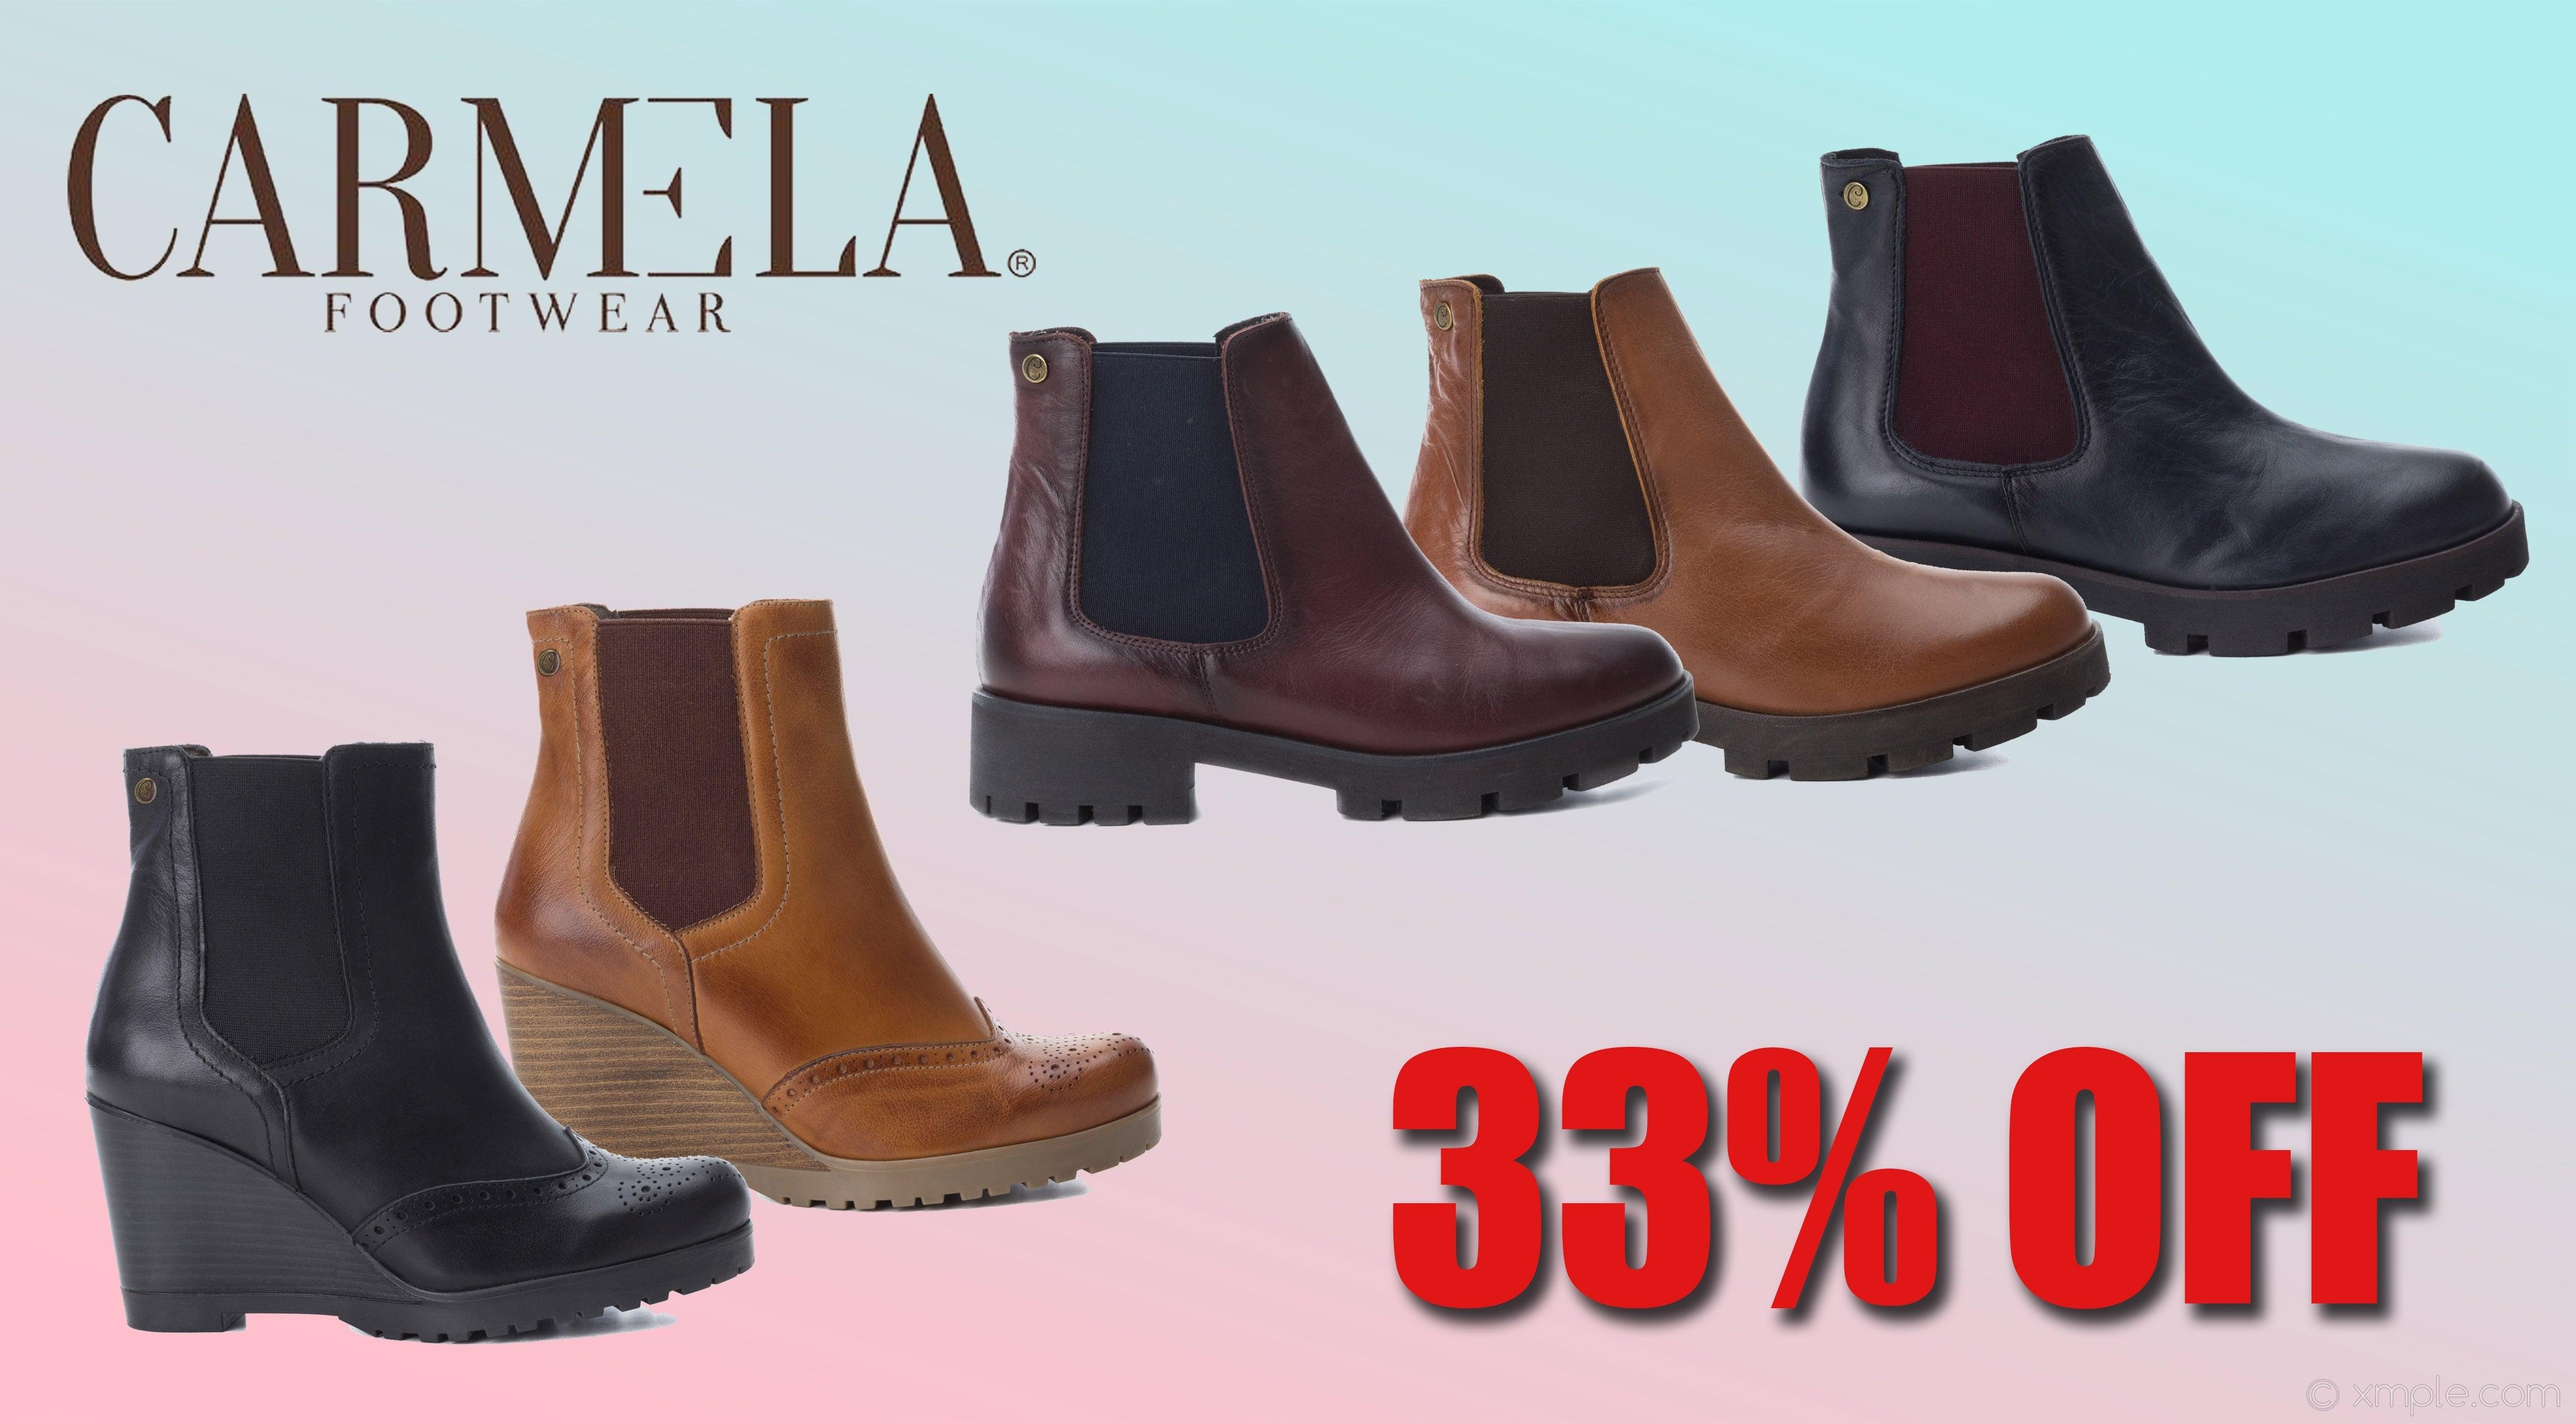 Carmela 33% OFF